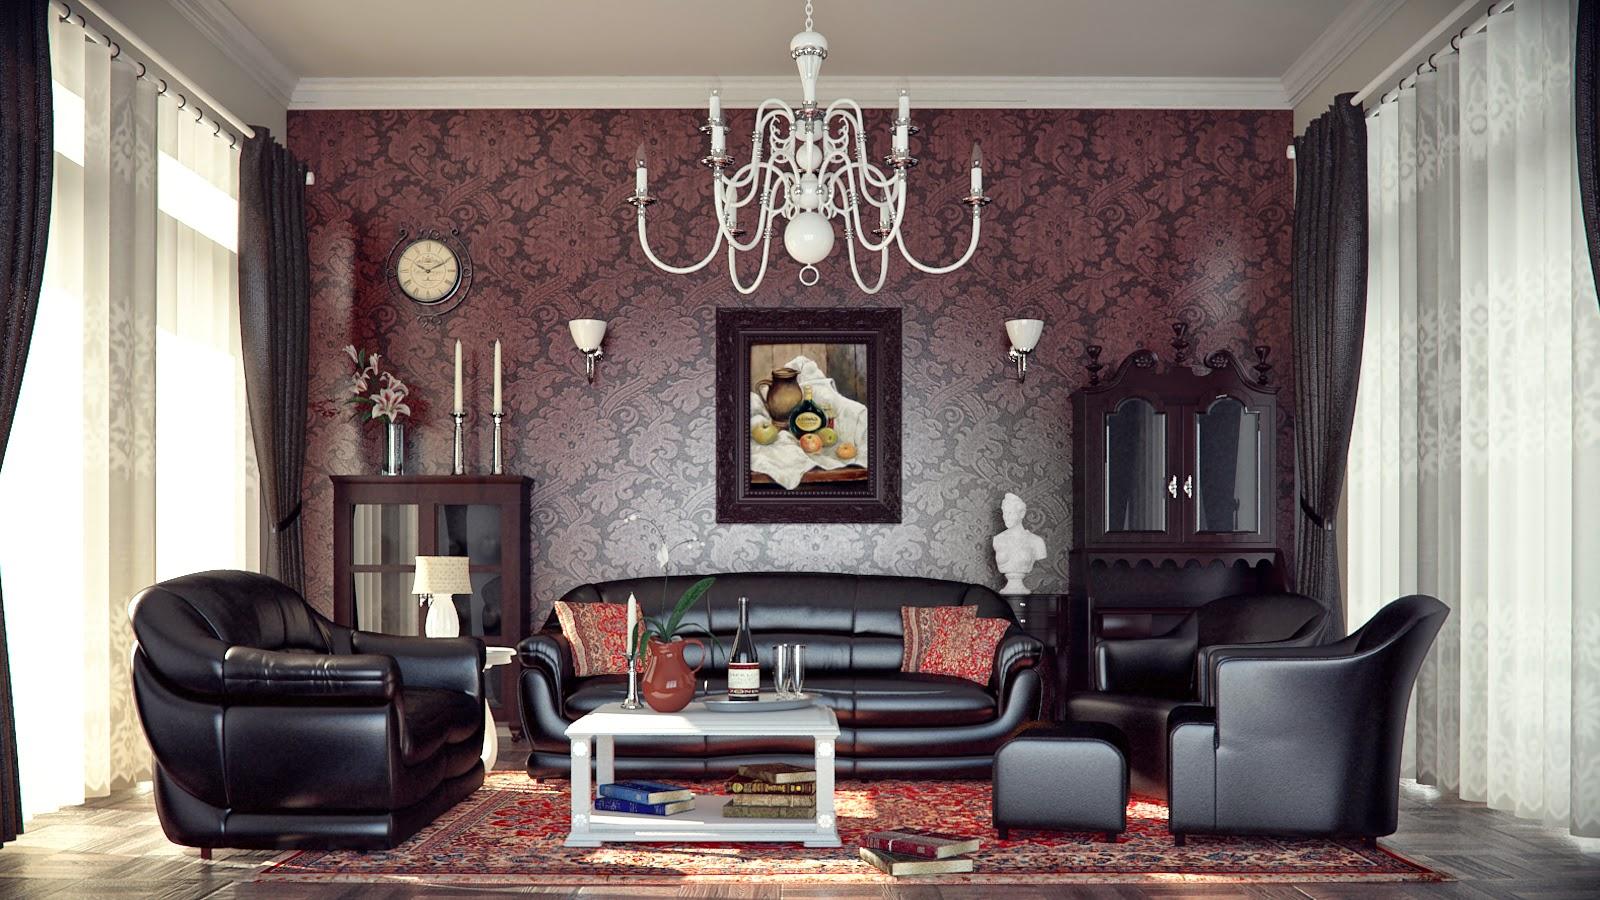 Interior Wonderful Ideas Of White Stone Wall Living Room: #9 Wonderful Interior Design Photos